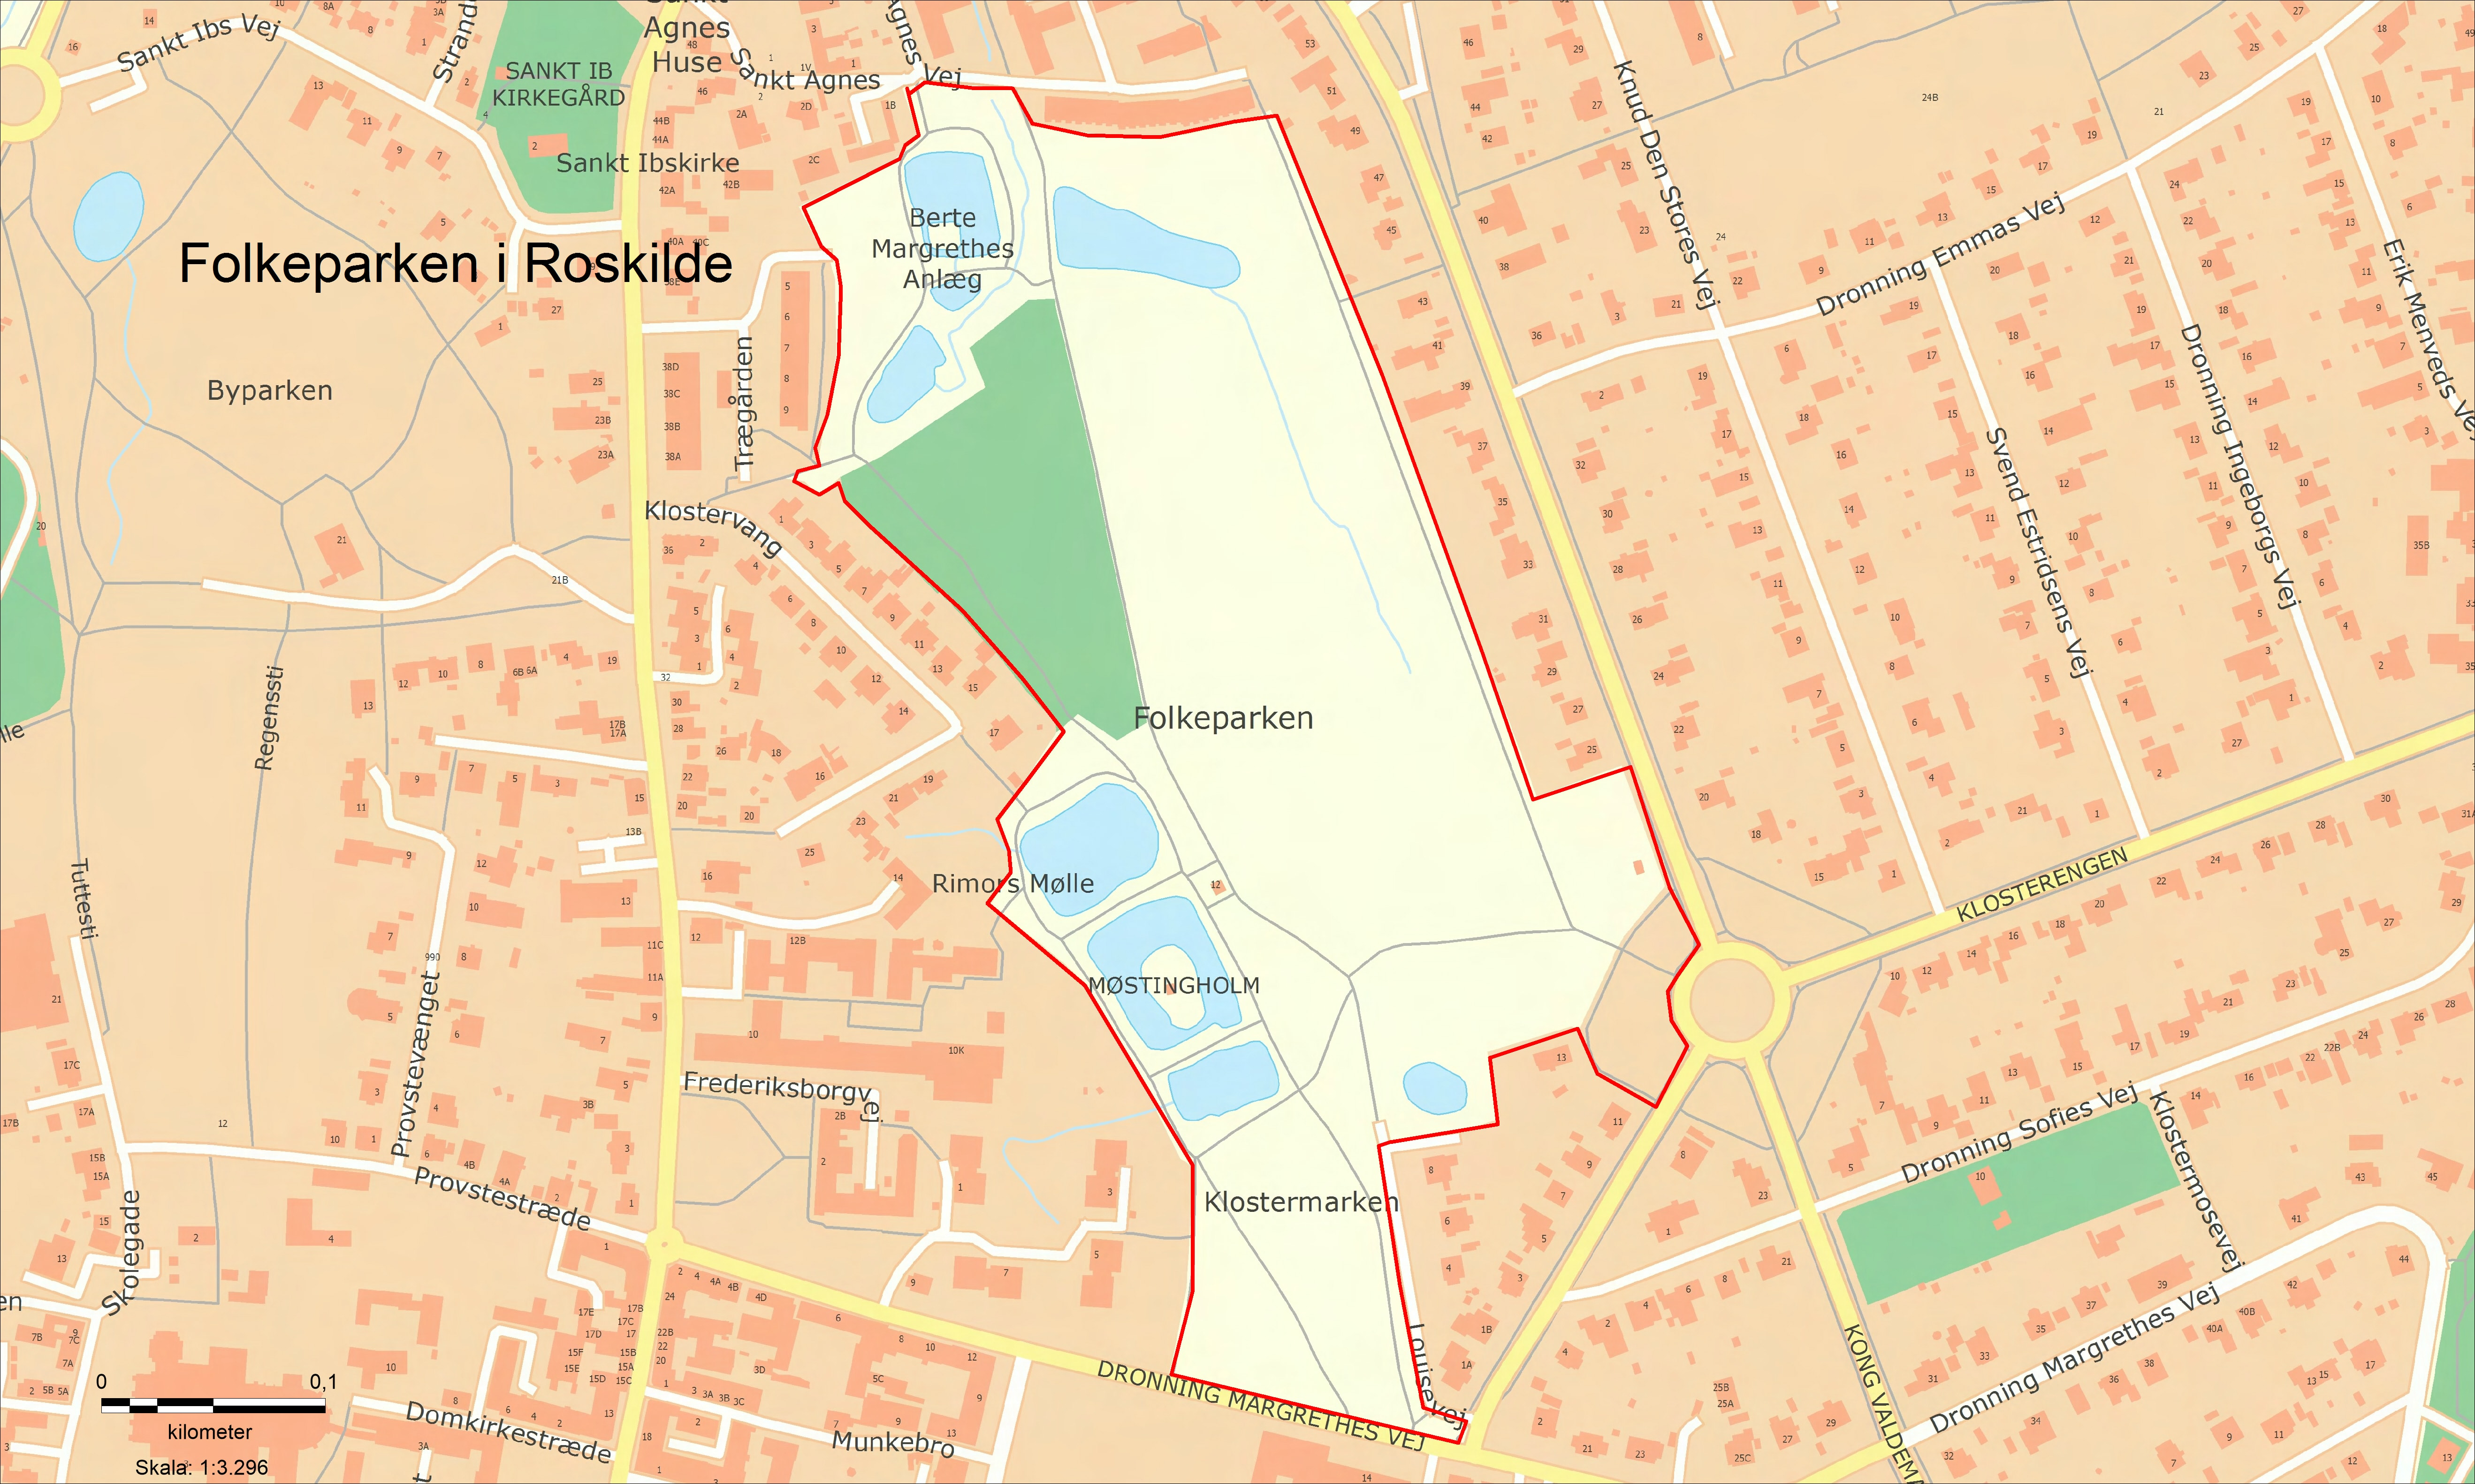 Opholdsforbud Folkeparken Roskilde